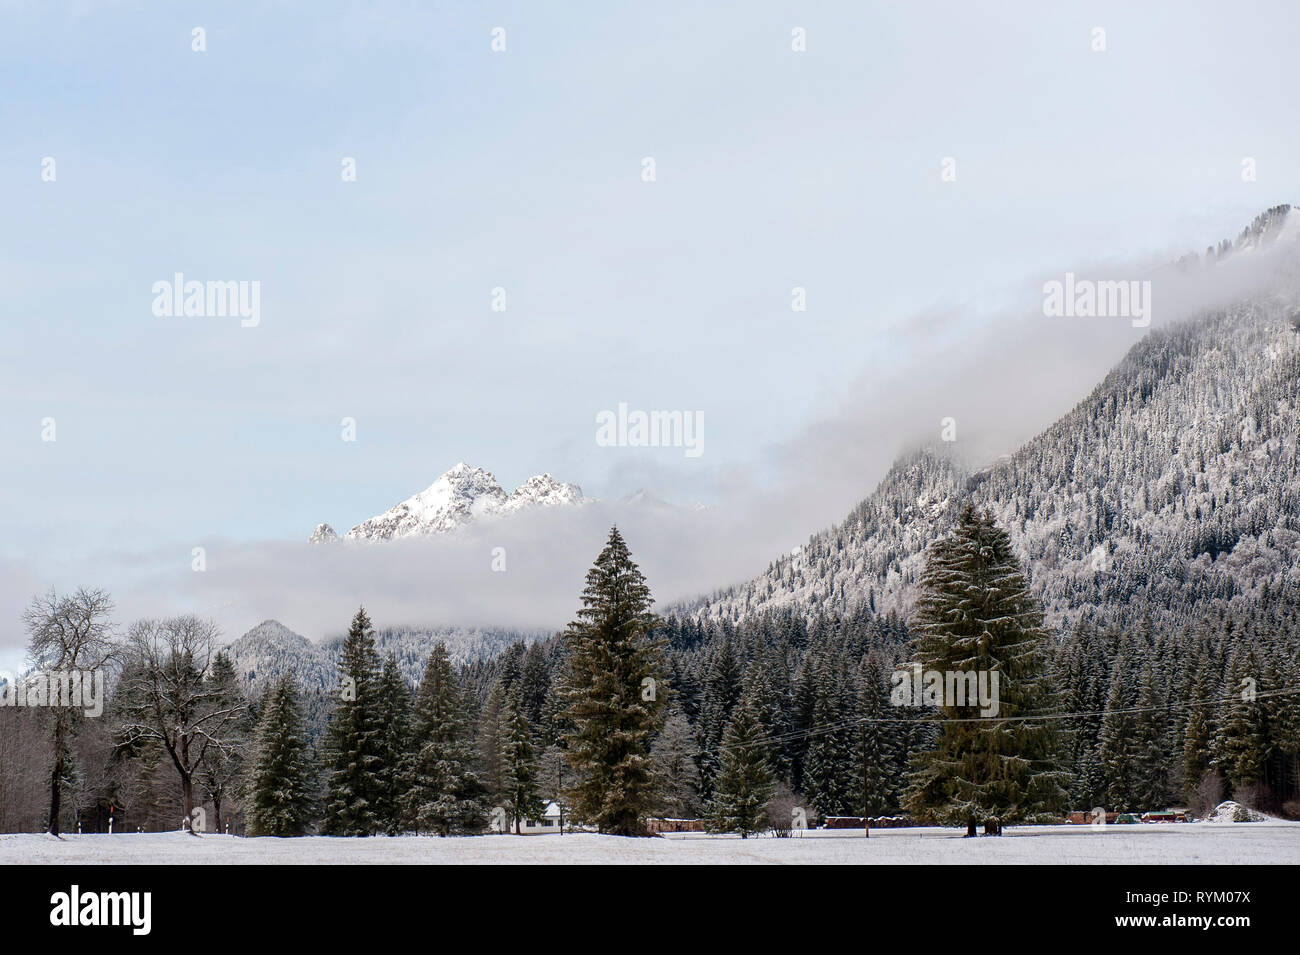 Landscape near Schloss Linderhof, Oberammergau, Upper Bavaria, Germany - Stock Image